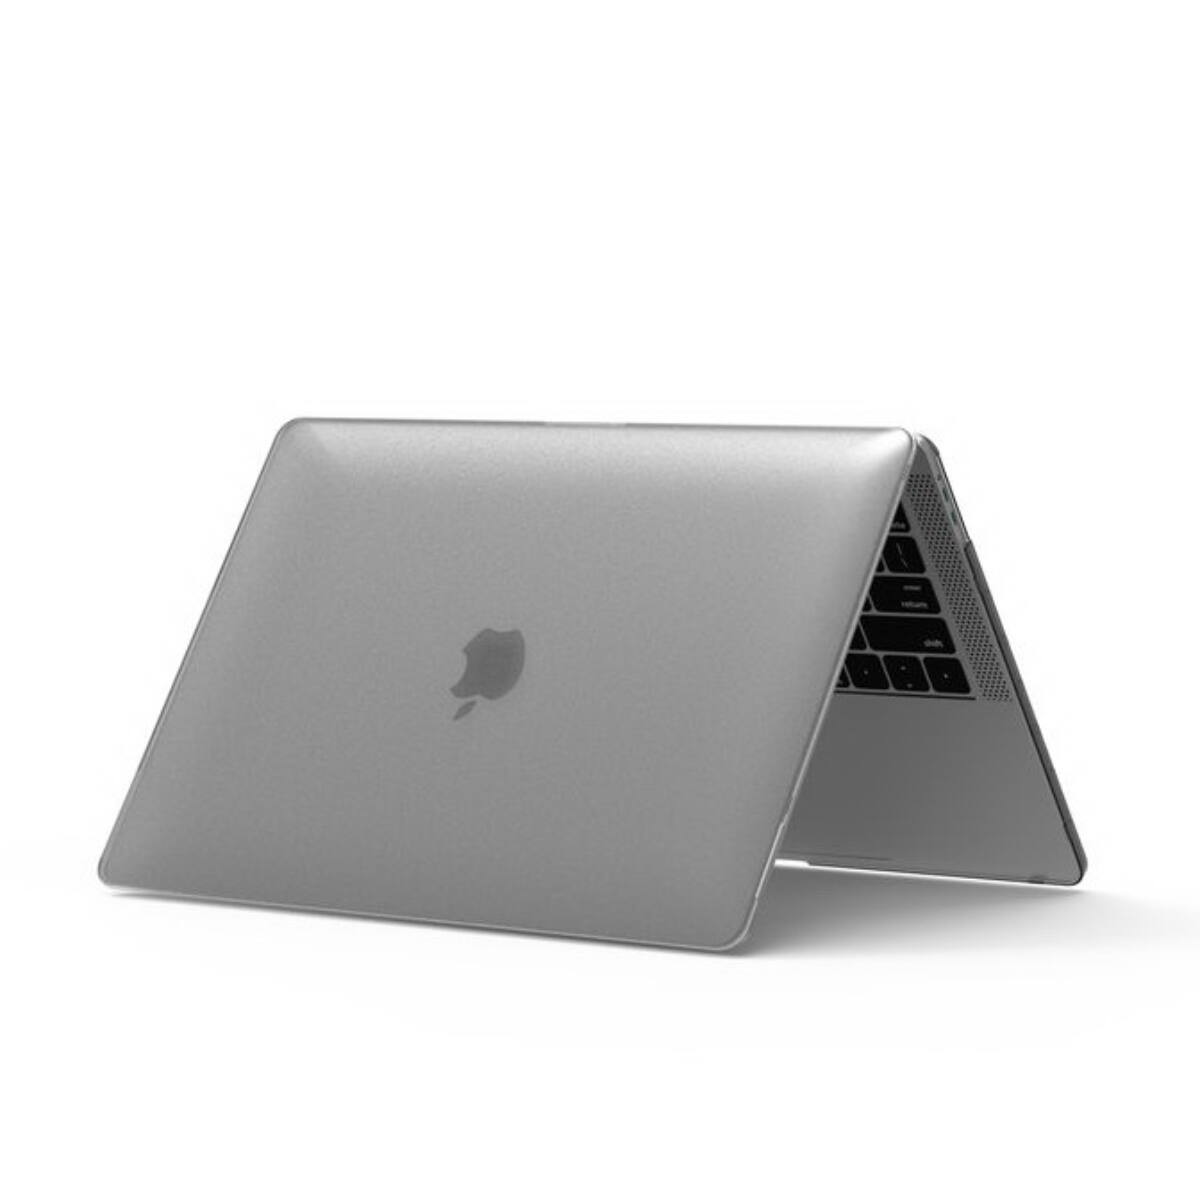 WiWU MacBook 12 inch (2015-2018) tok, iSHIELD Hard Shell borító, Fehér átlátszó